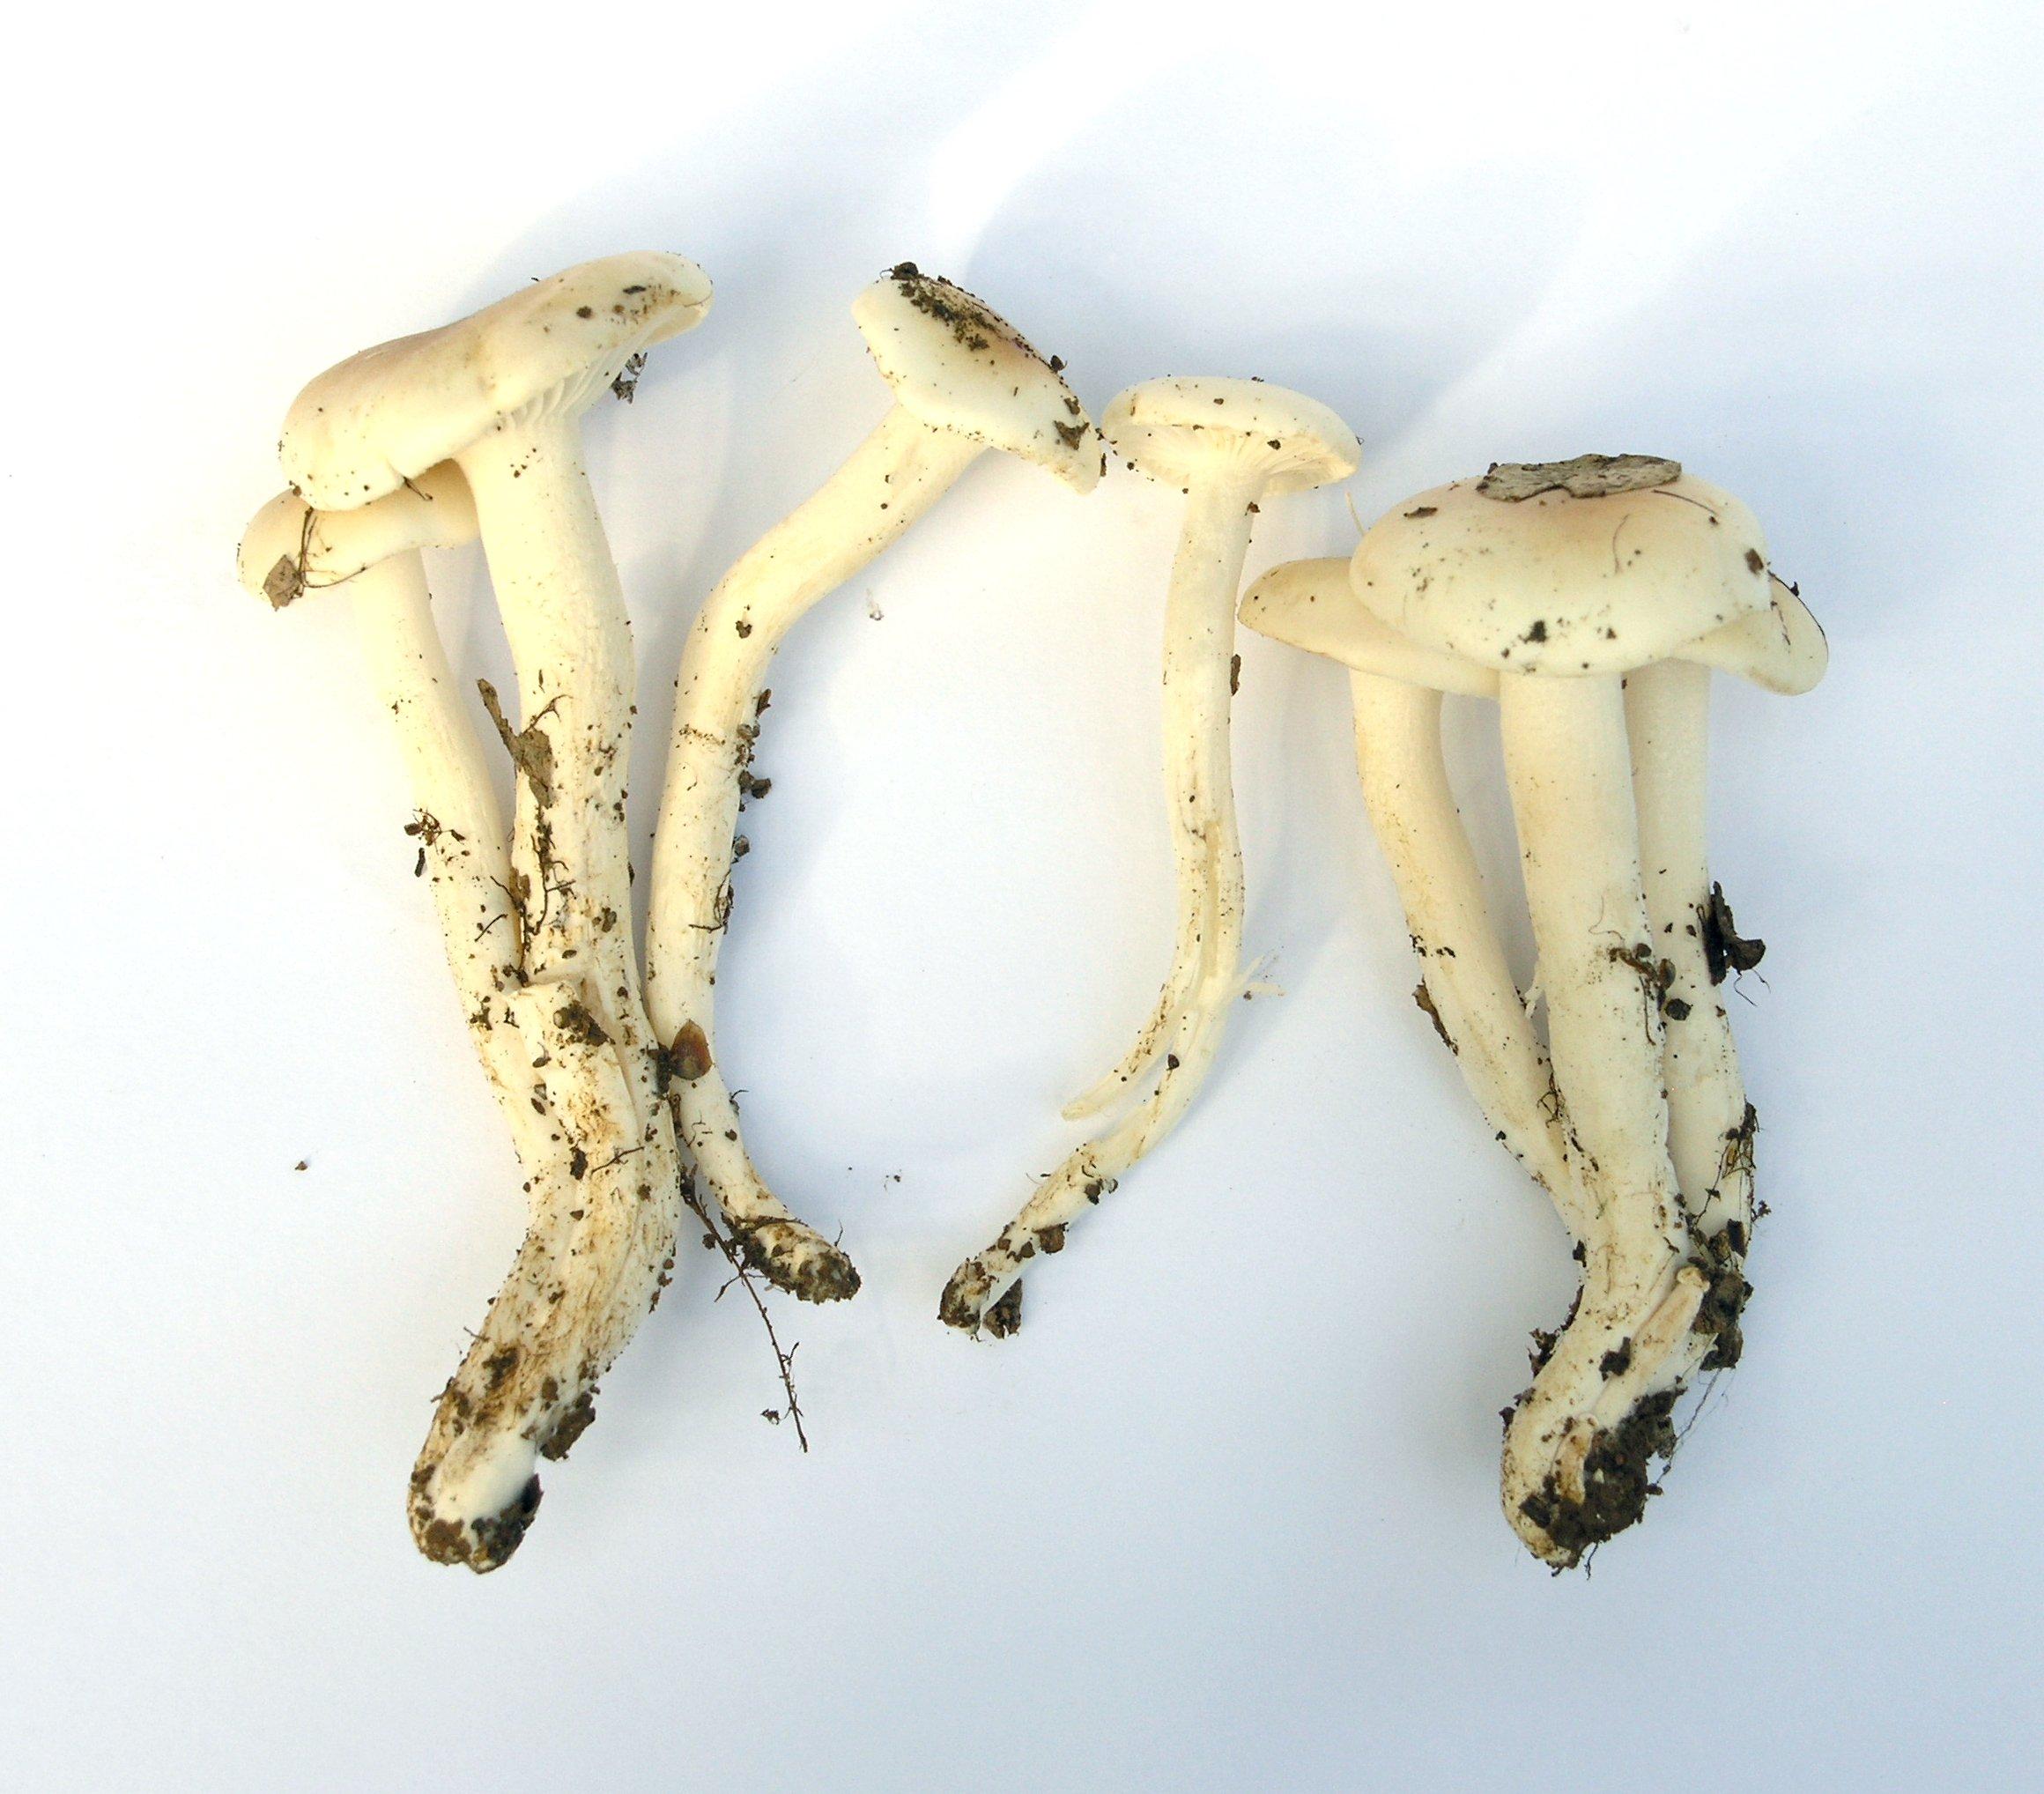 Hygrocybe brunnea image